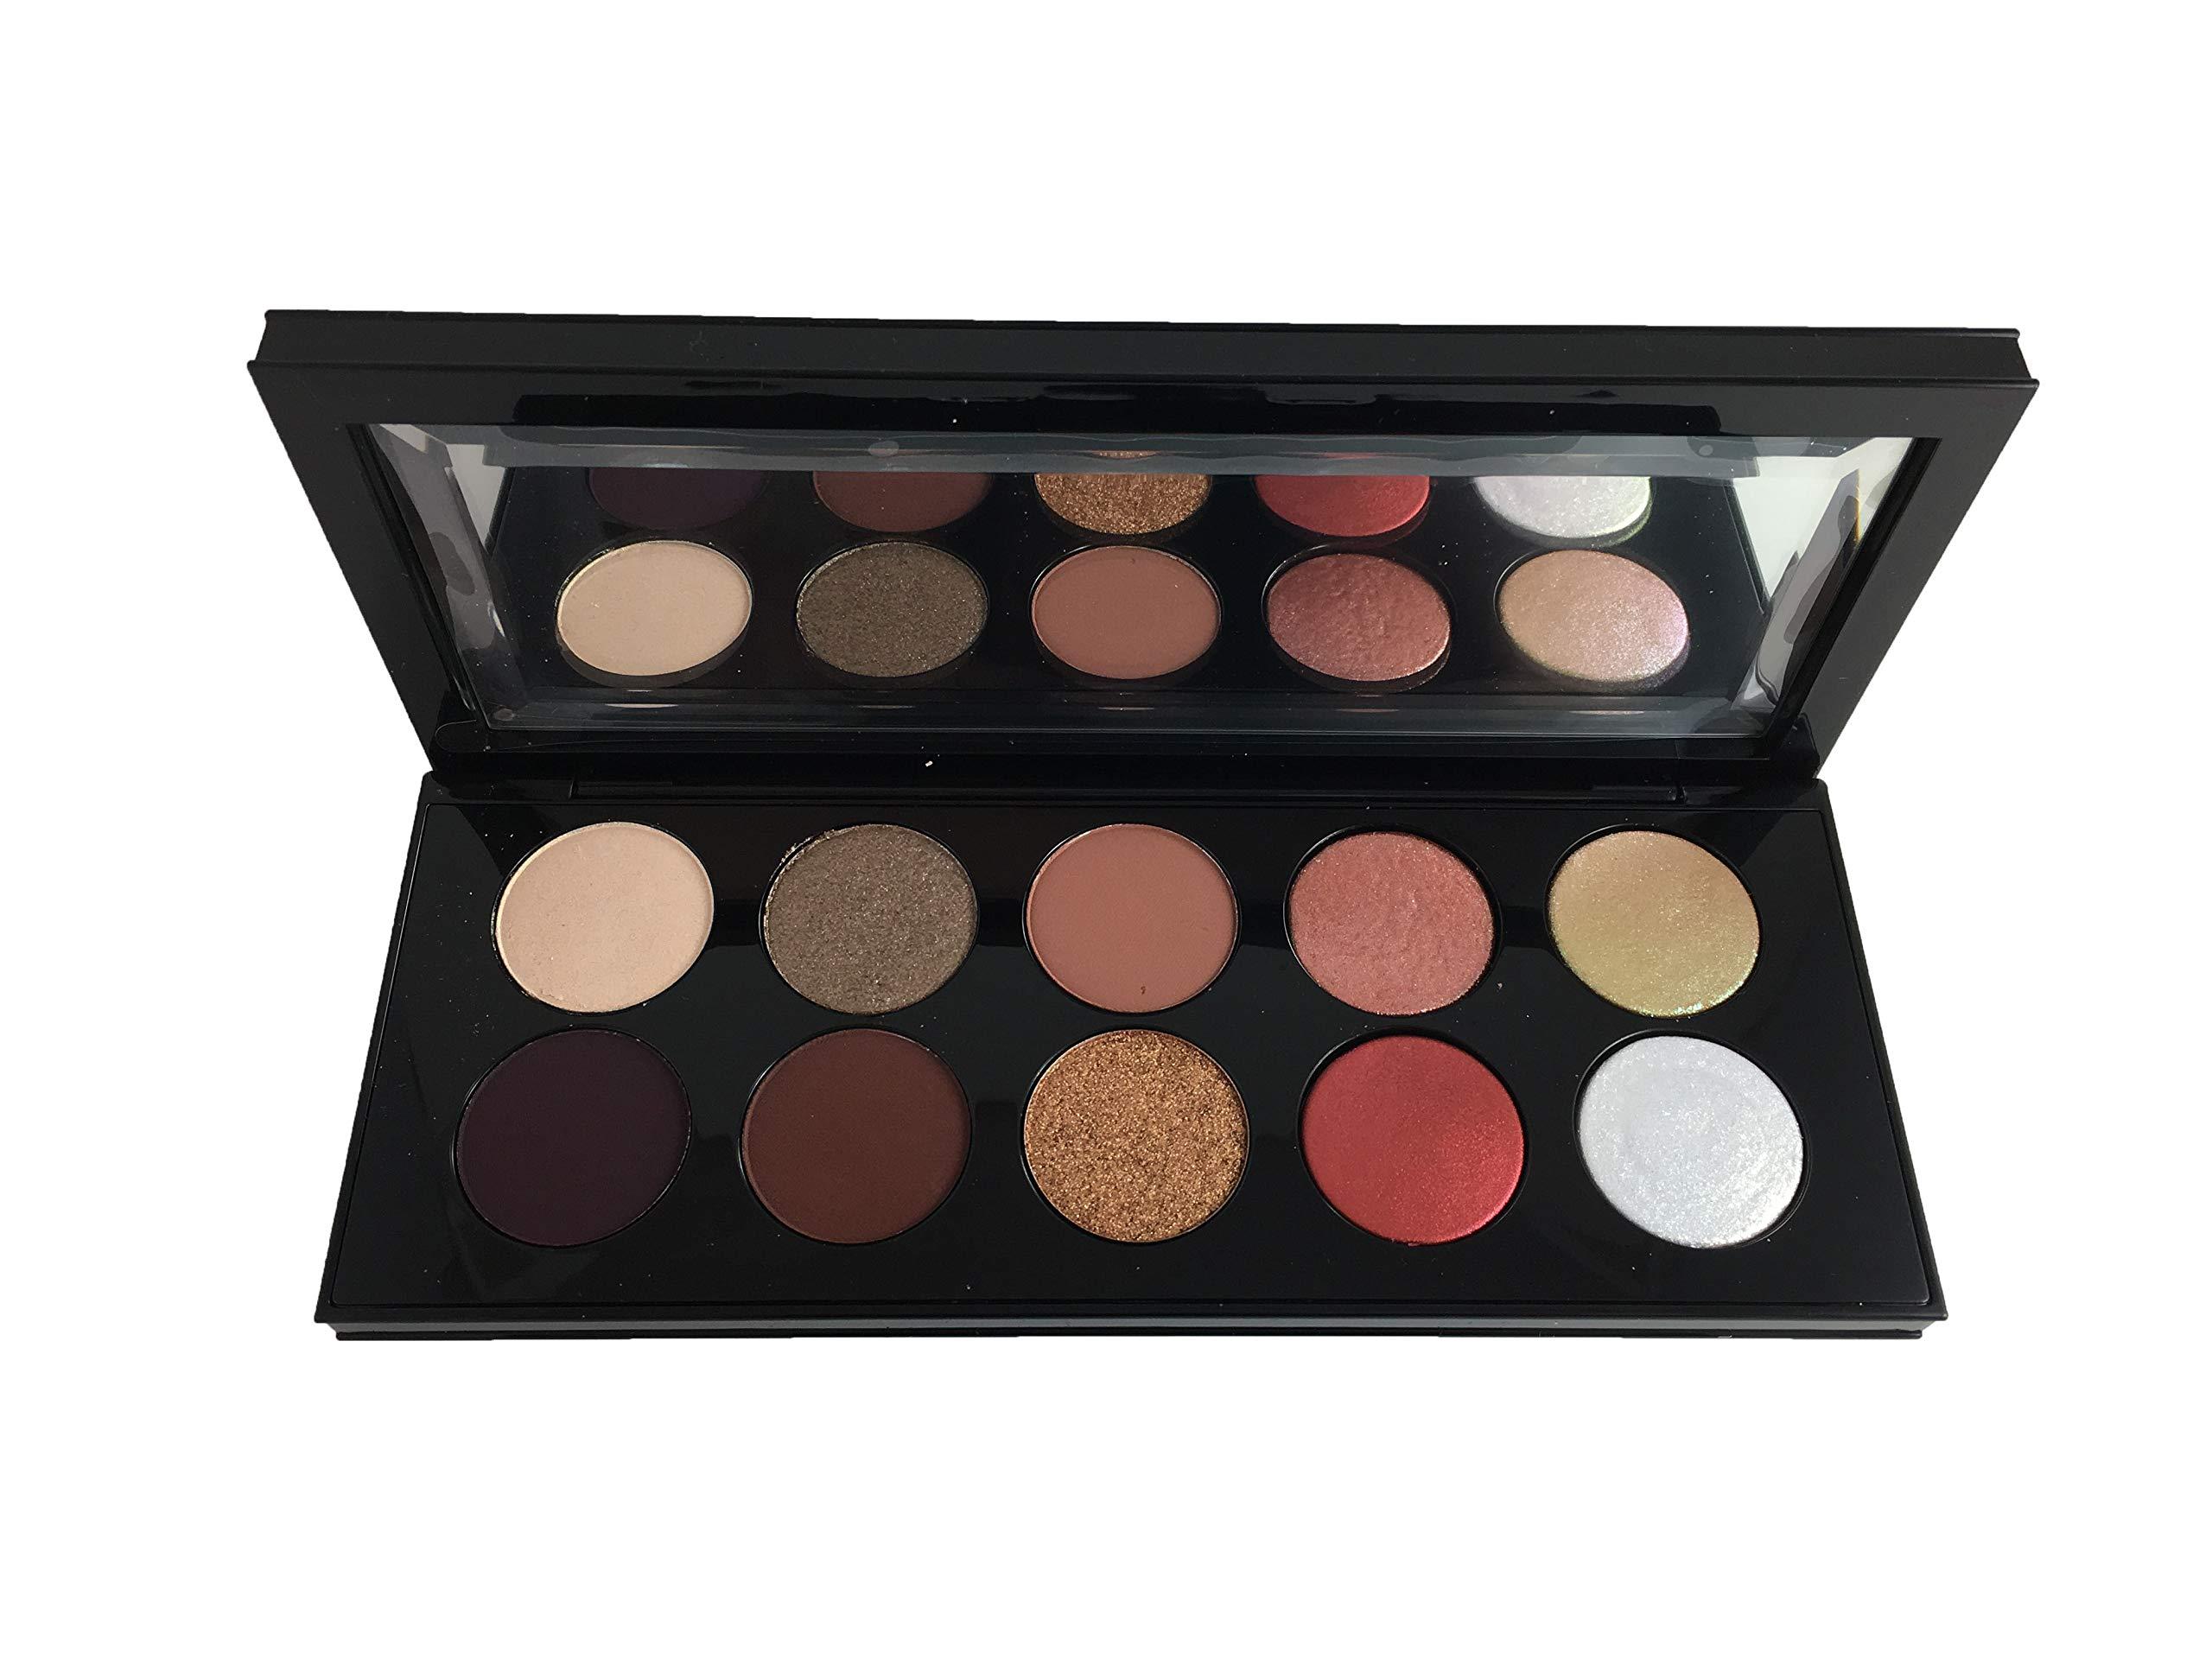 Pat McGrath Labs PMG x The Met Mothership V: Bronze Seduction Eye Palette